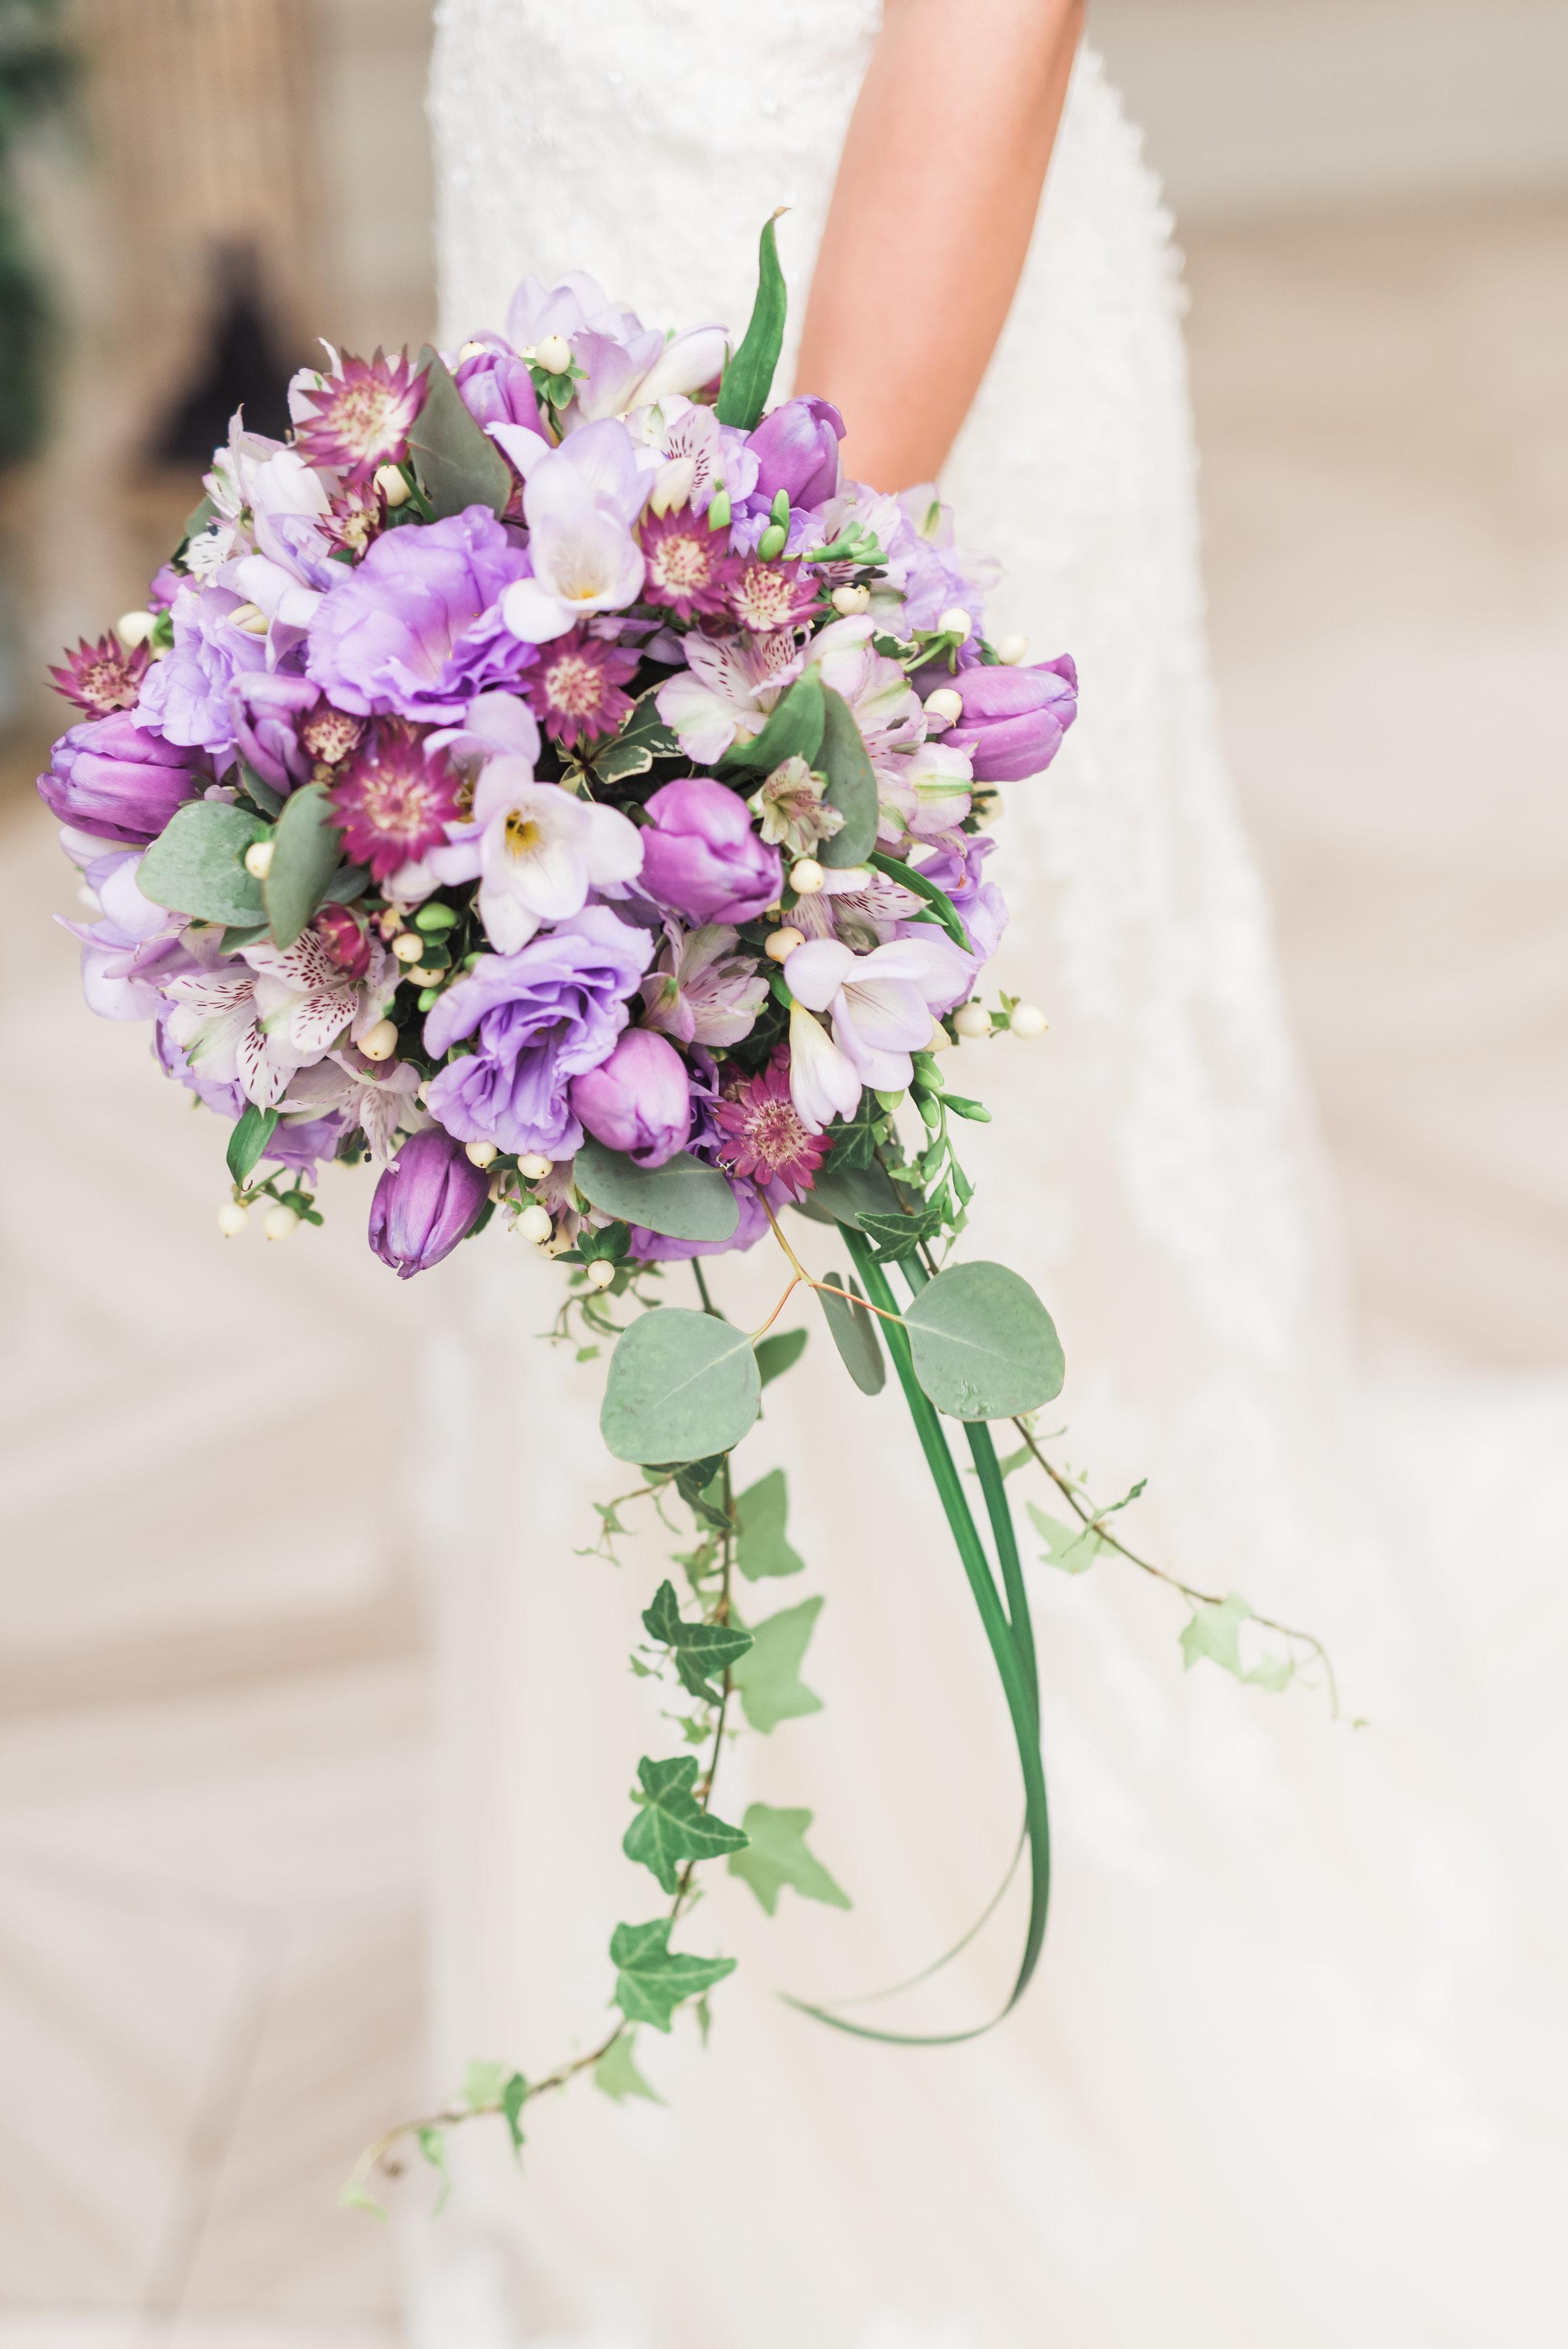 Flowers archives secrets floral collection teardrop cascade bridal bouquet with purple tulips lisianthus freesia astrantia alstromeria izmirmasajfo